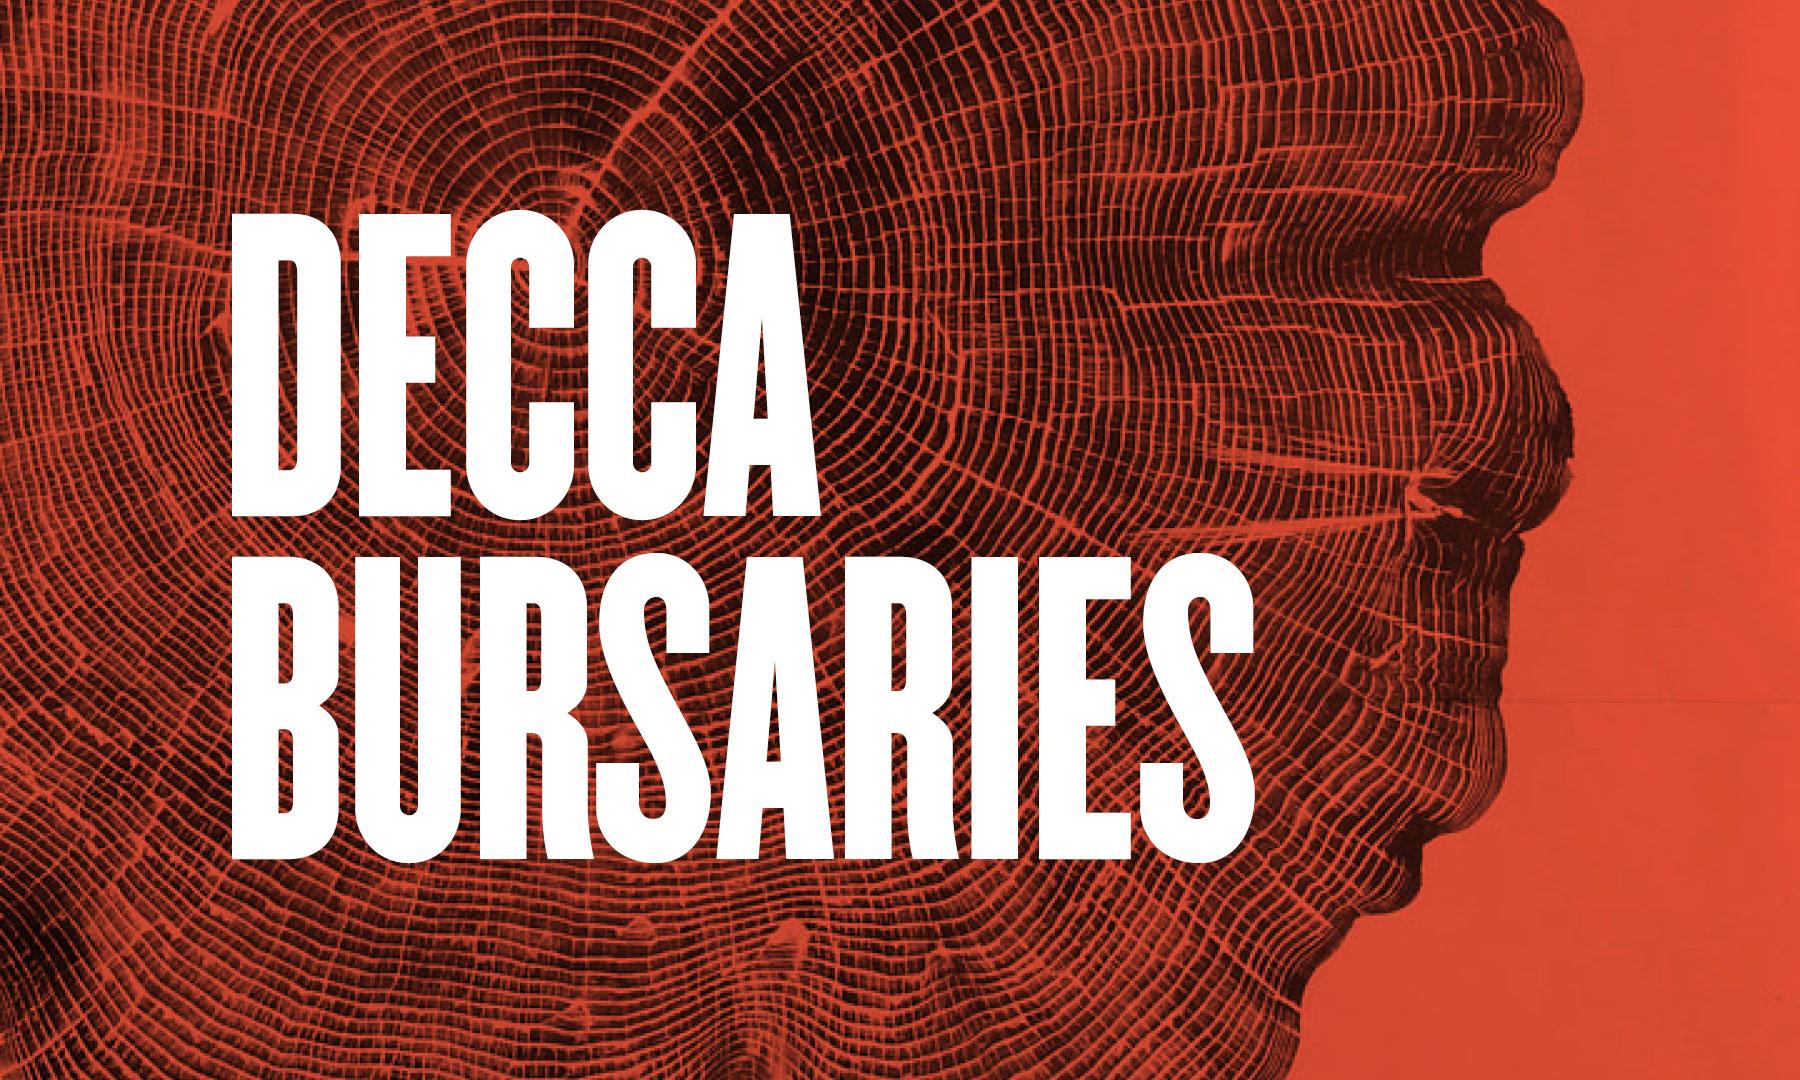 Decca_Bursaries8